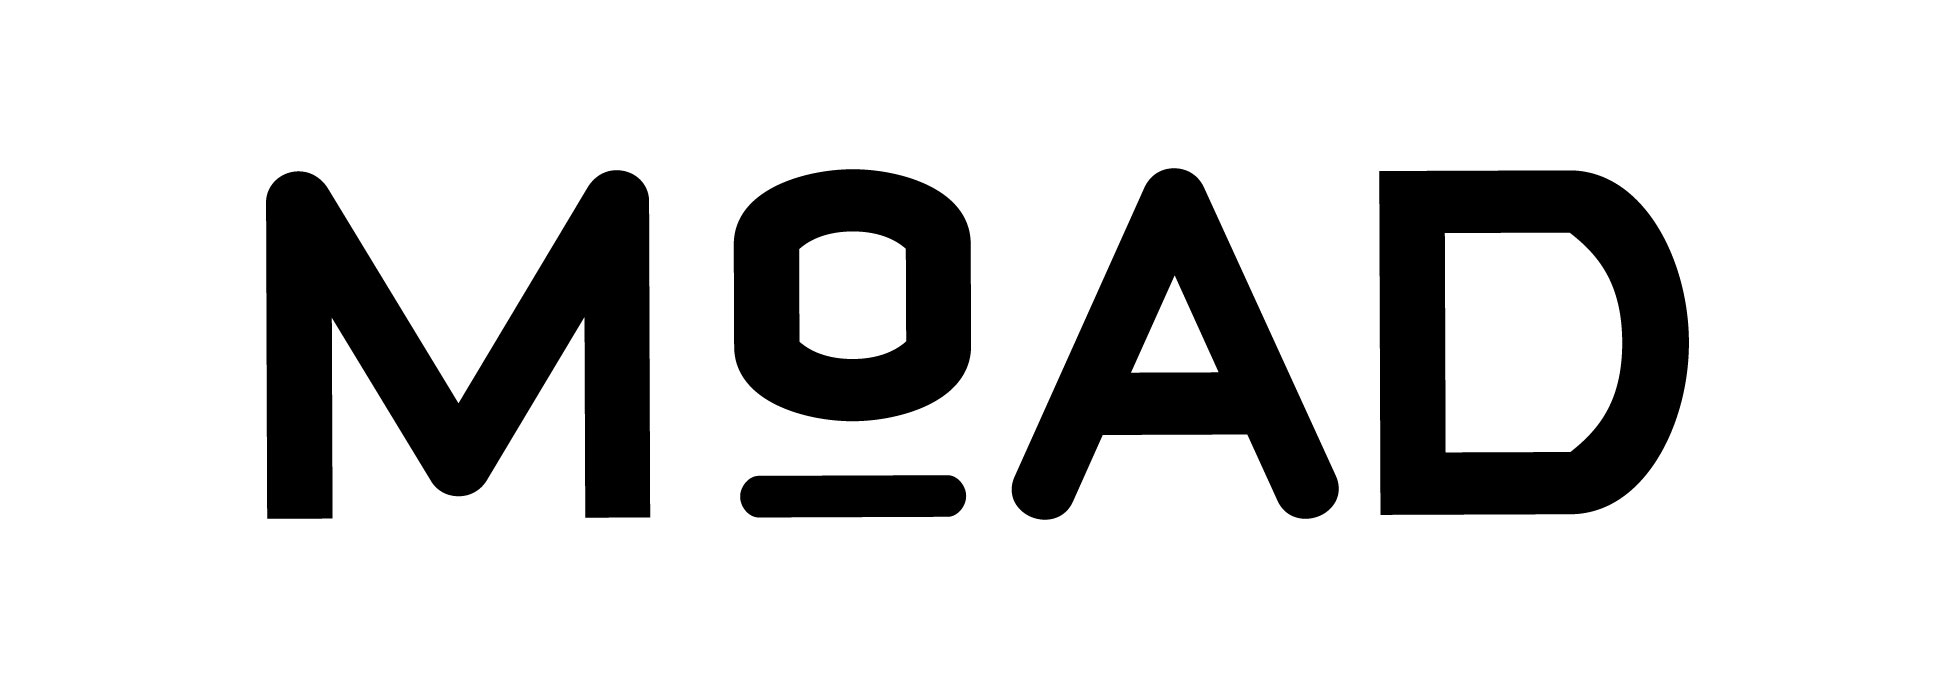 MoAD_logo-no_type.jpg